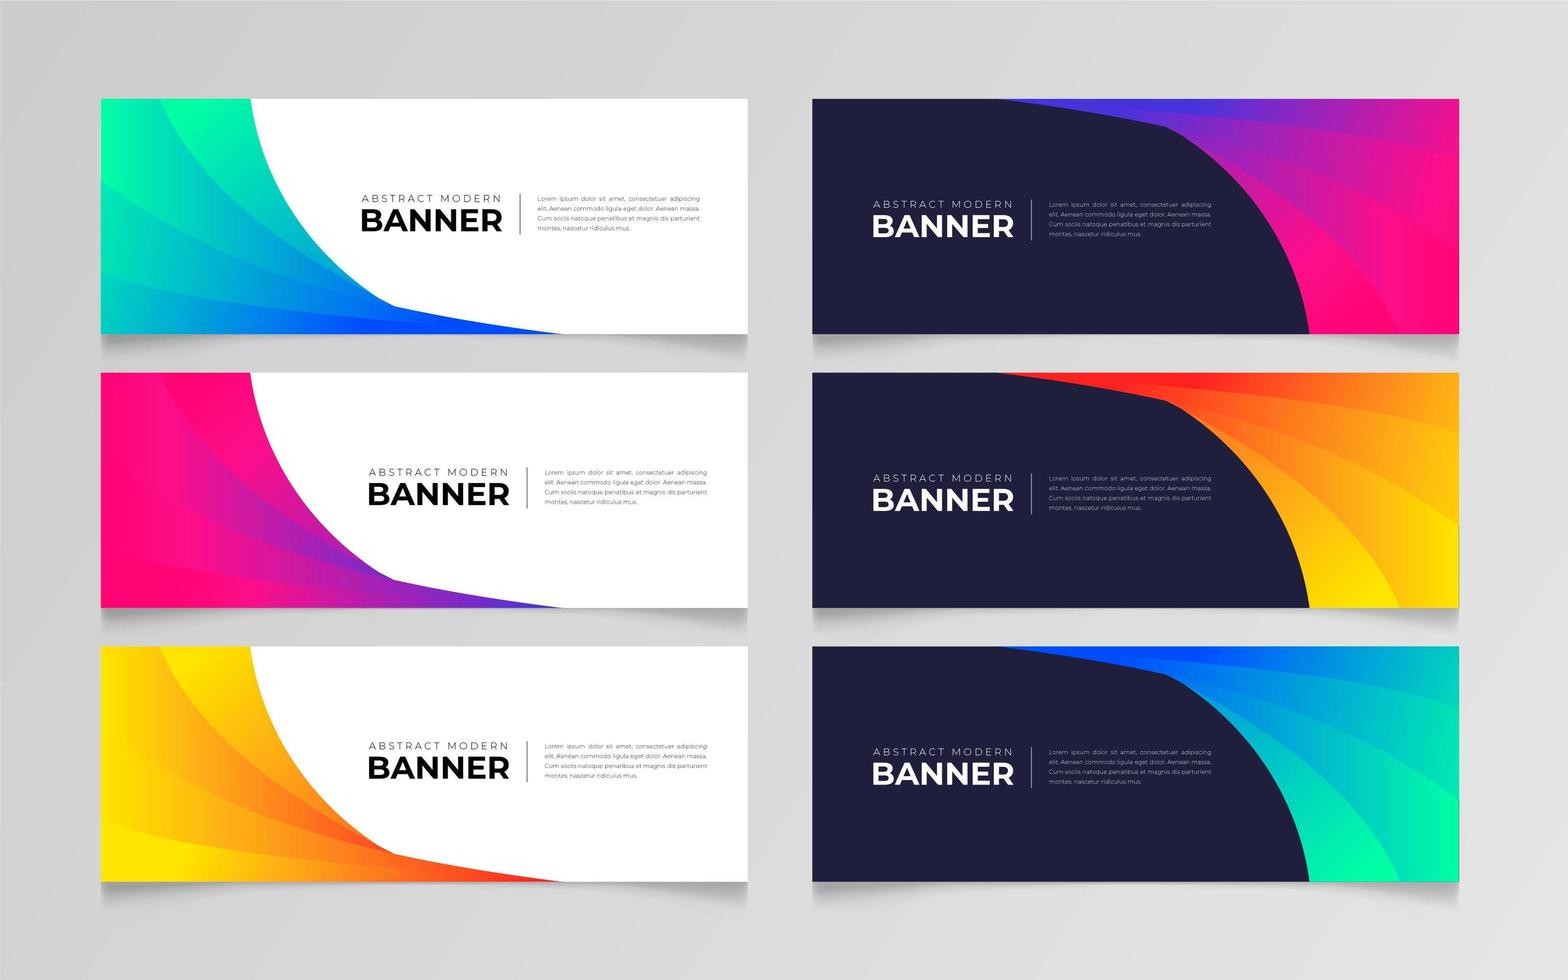 conjunto de banner abstracto degradado colorido vector